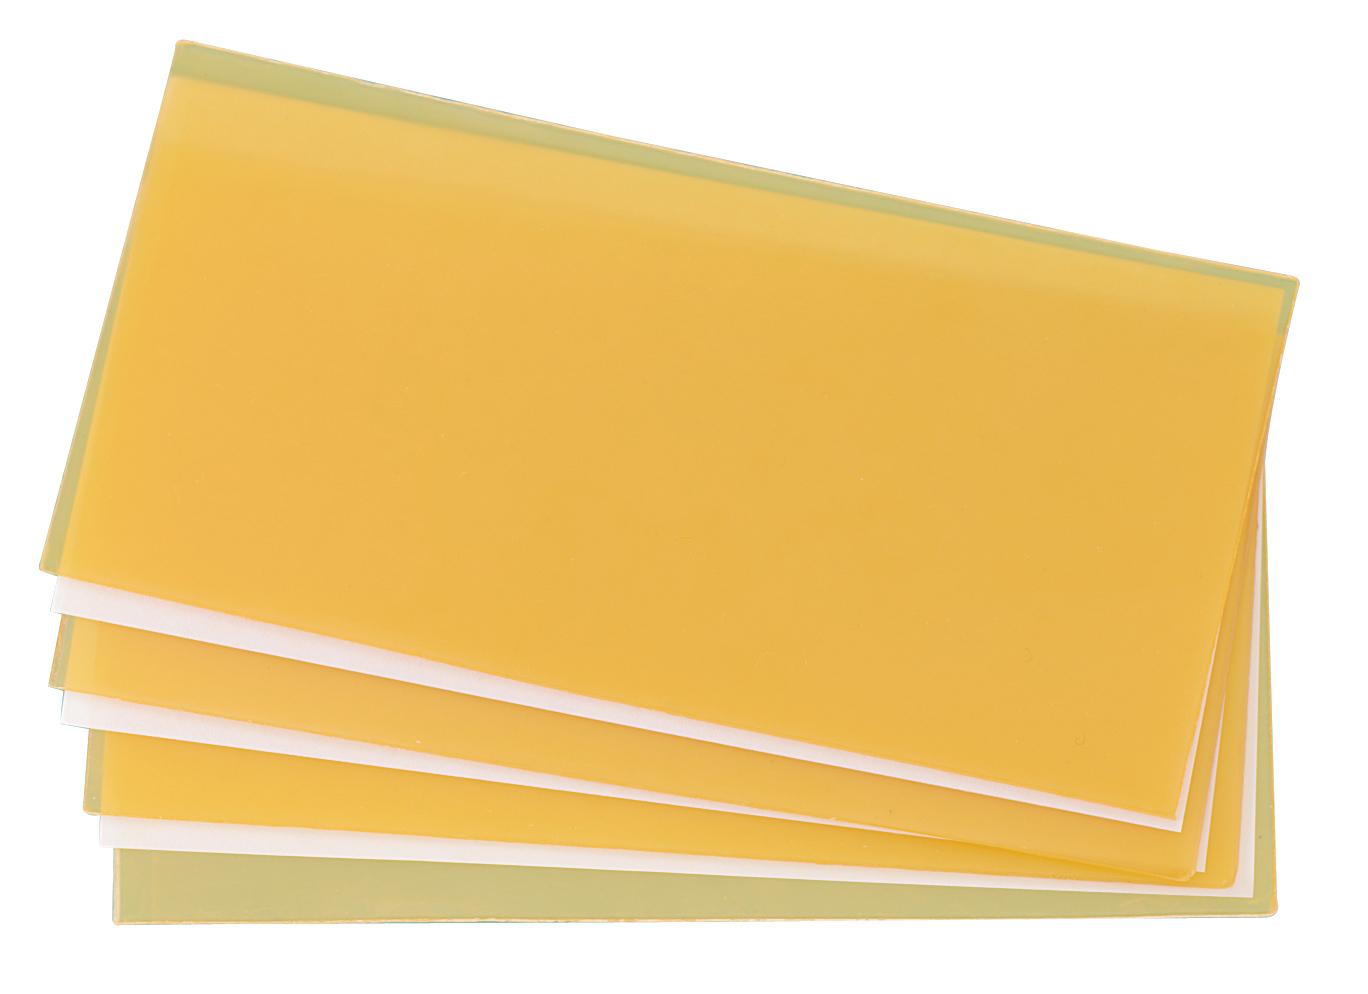 bees-wax-pure-yellow-1-lb-125-57250-miltex.jpg